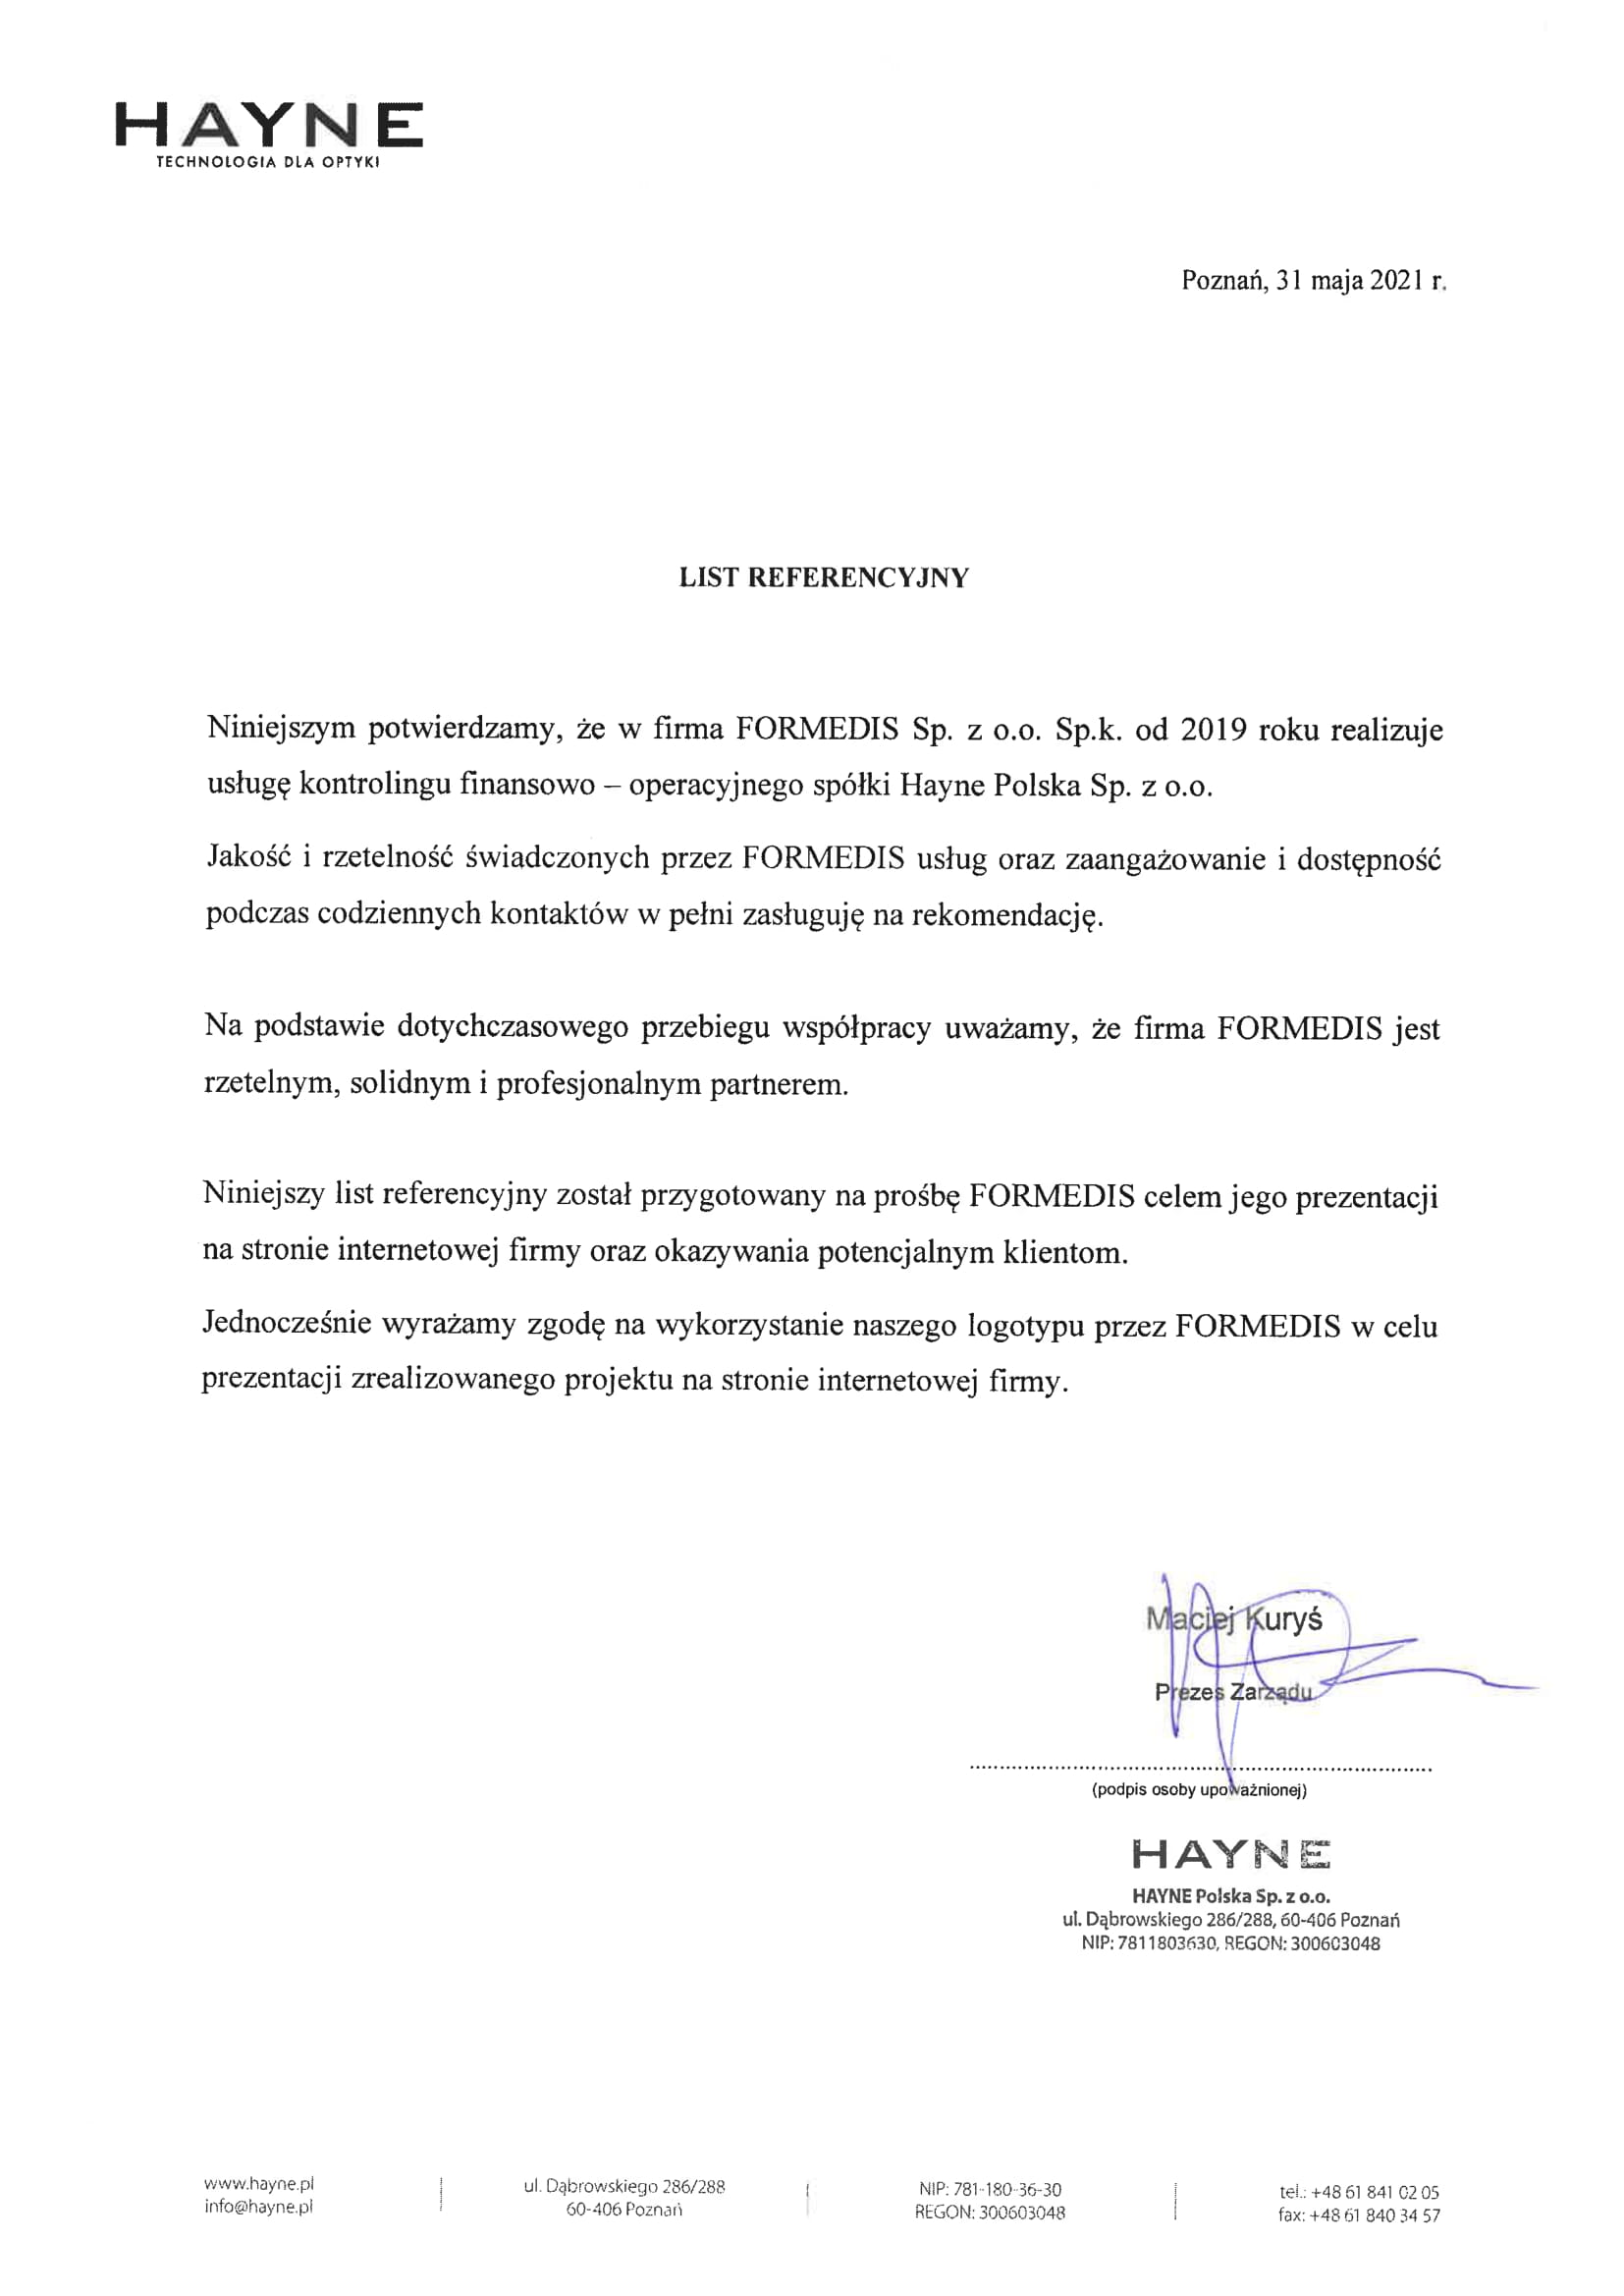 list Referencyjny HAYNE-1